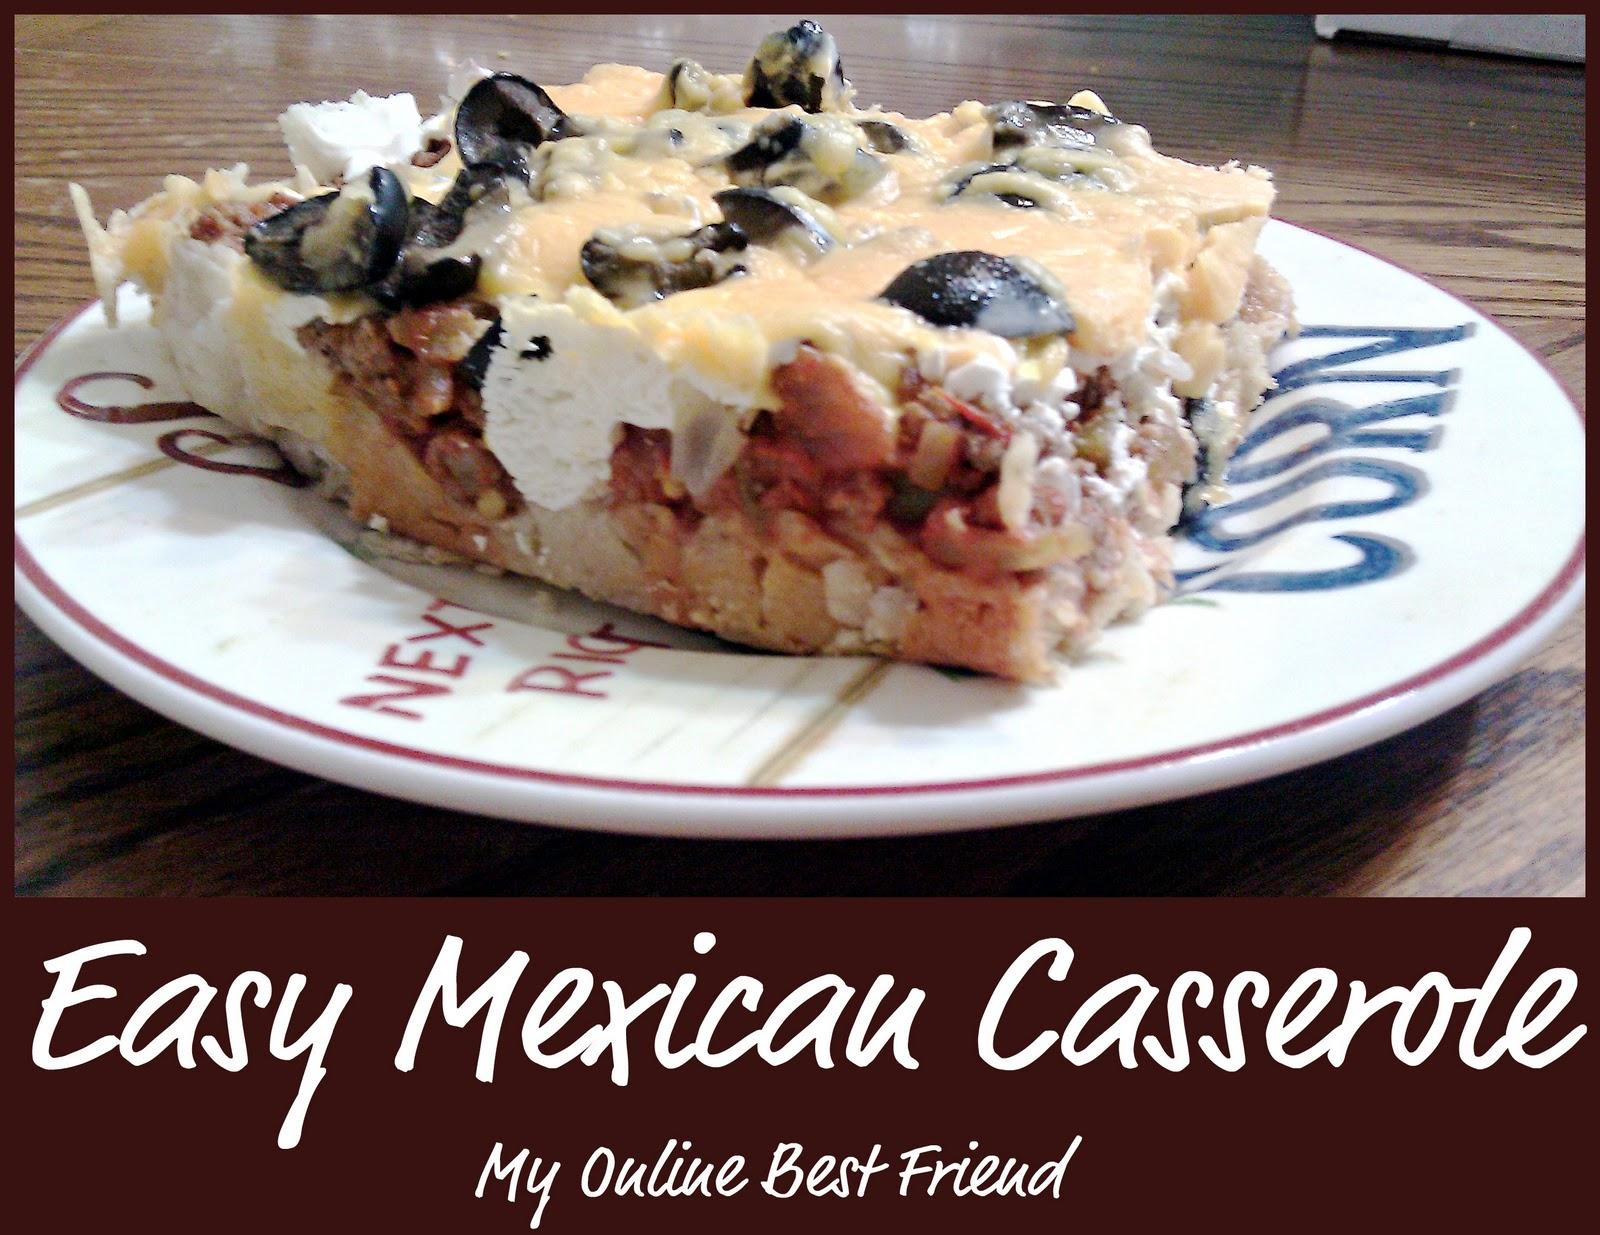 Easy+Mexican+Casserole.jpg